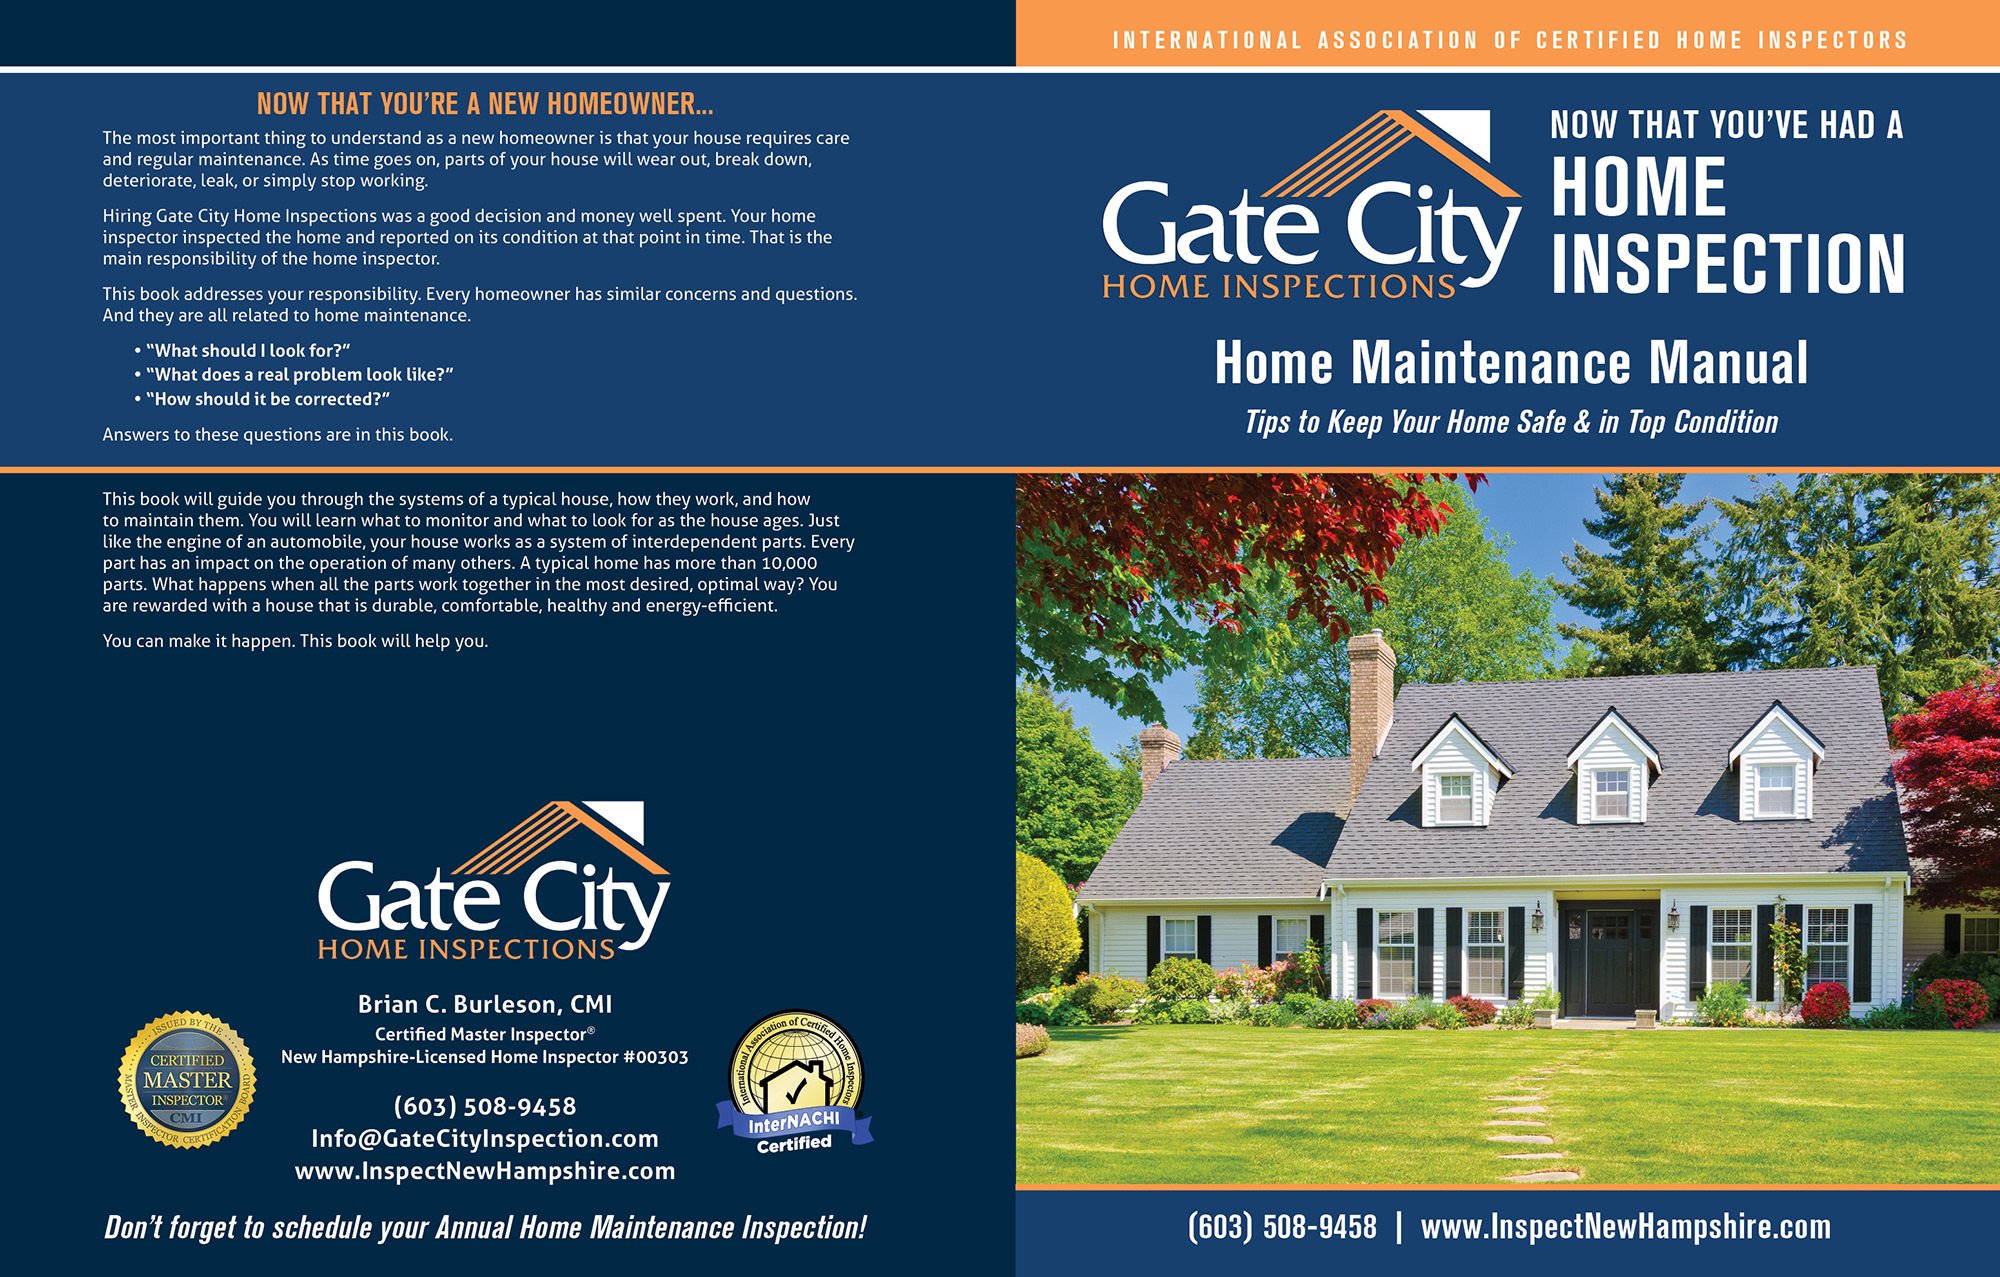 Custom Home Maintenance Book for Gate City Home Inspections.